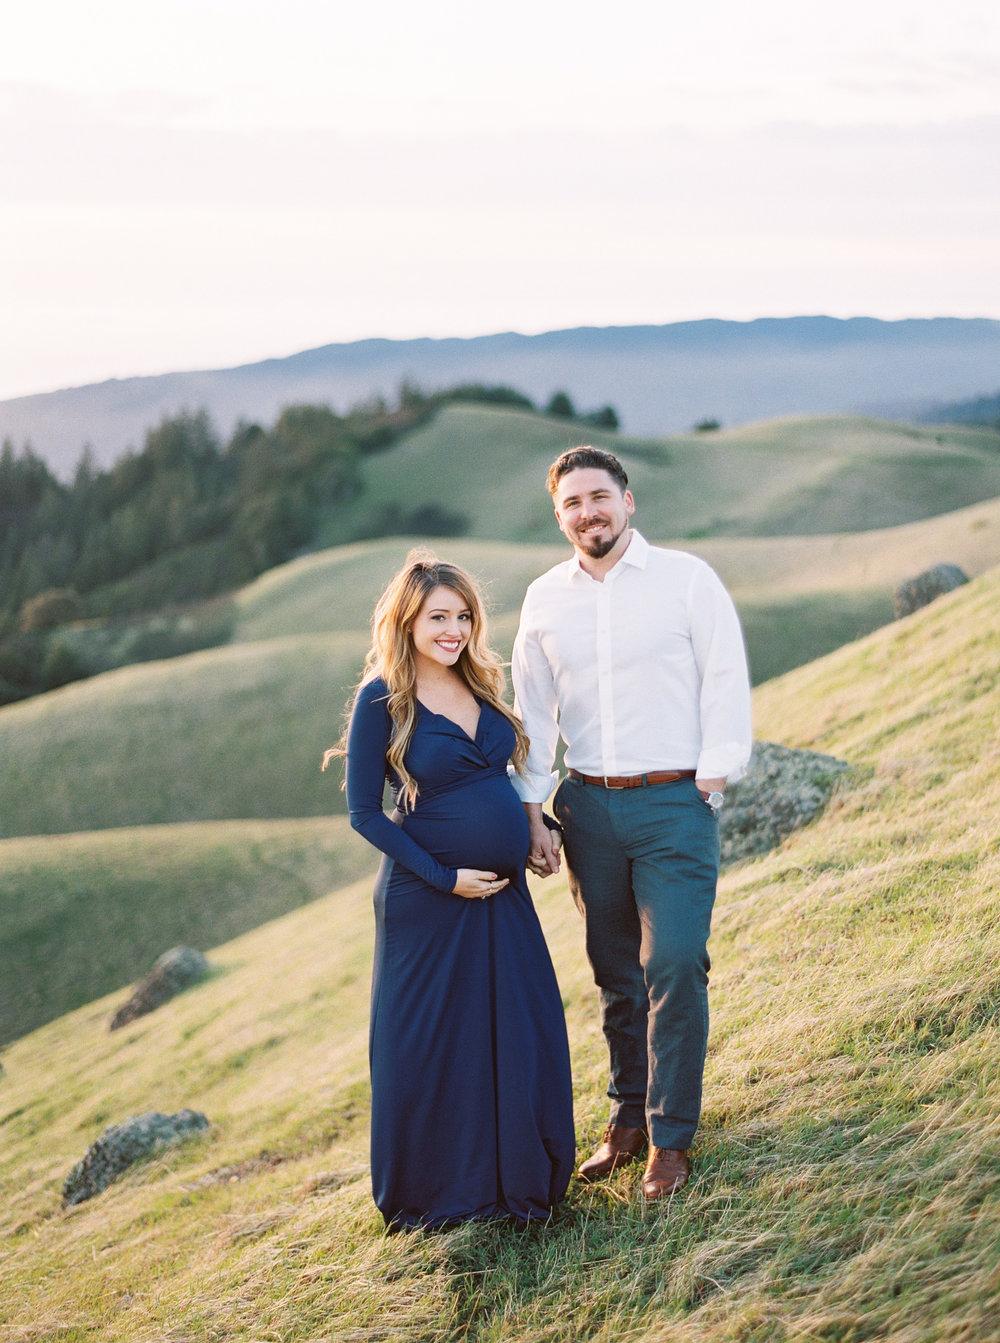 mount-tamalpais-san-francisco-maternity-photography-26.jpg